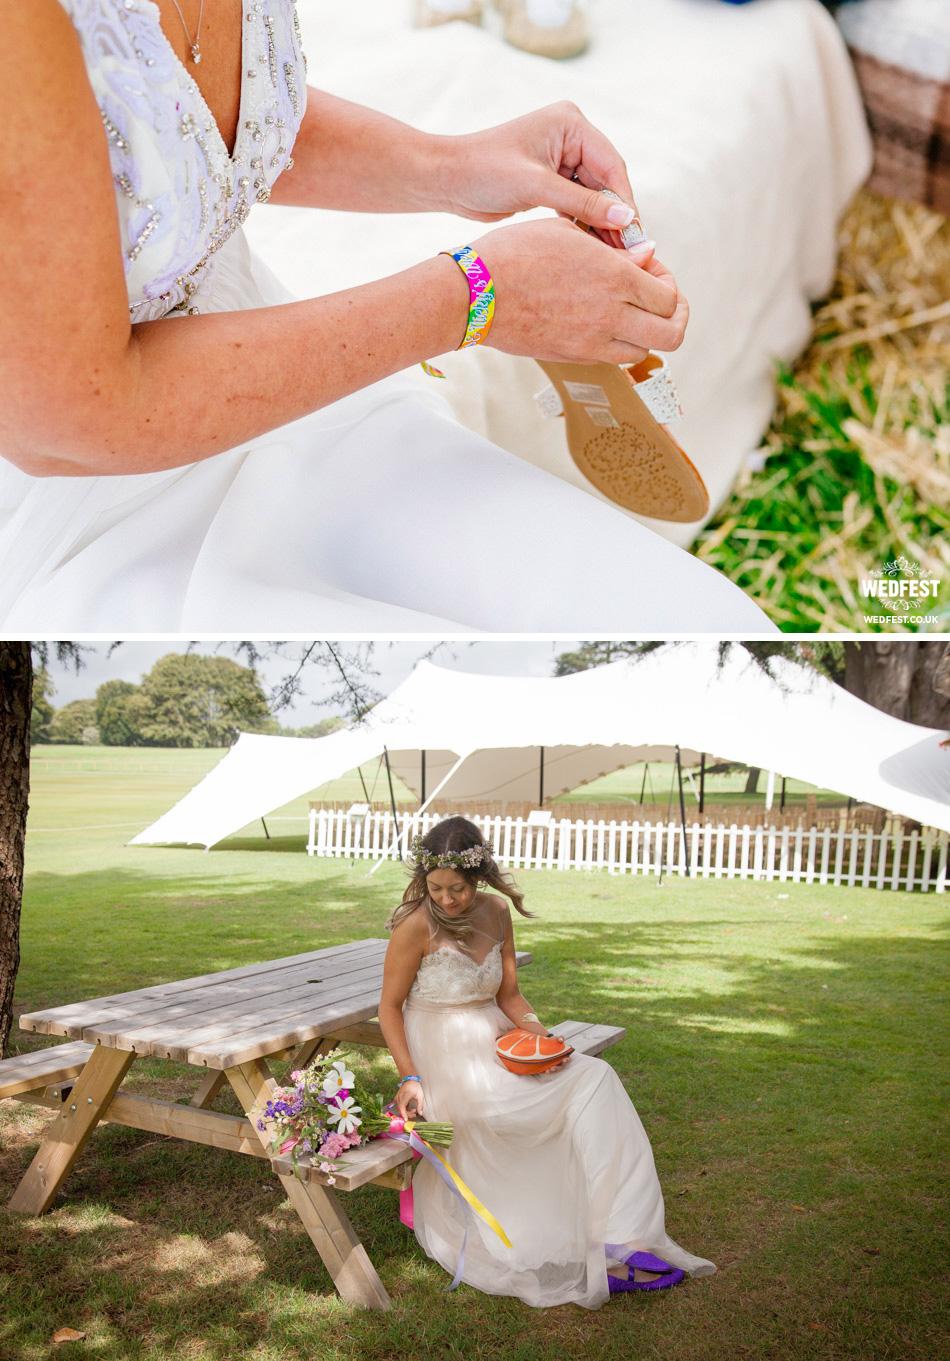 festival brides wedding wristbands